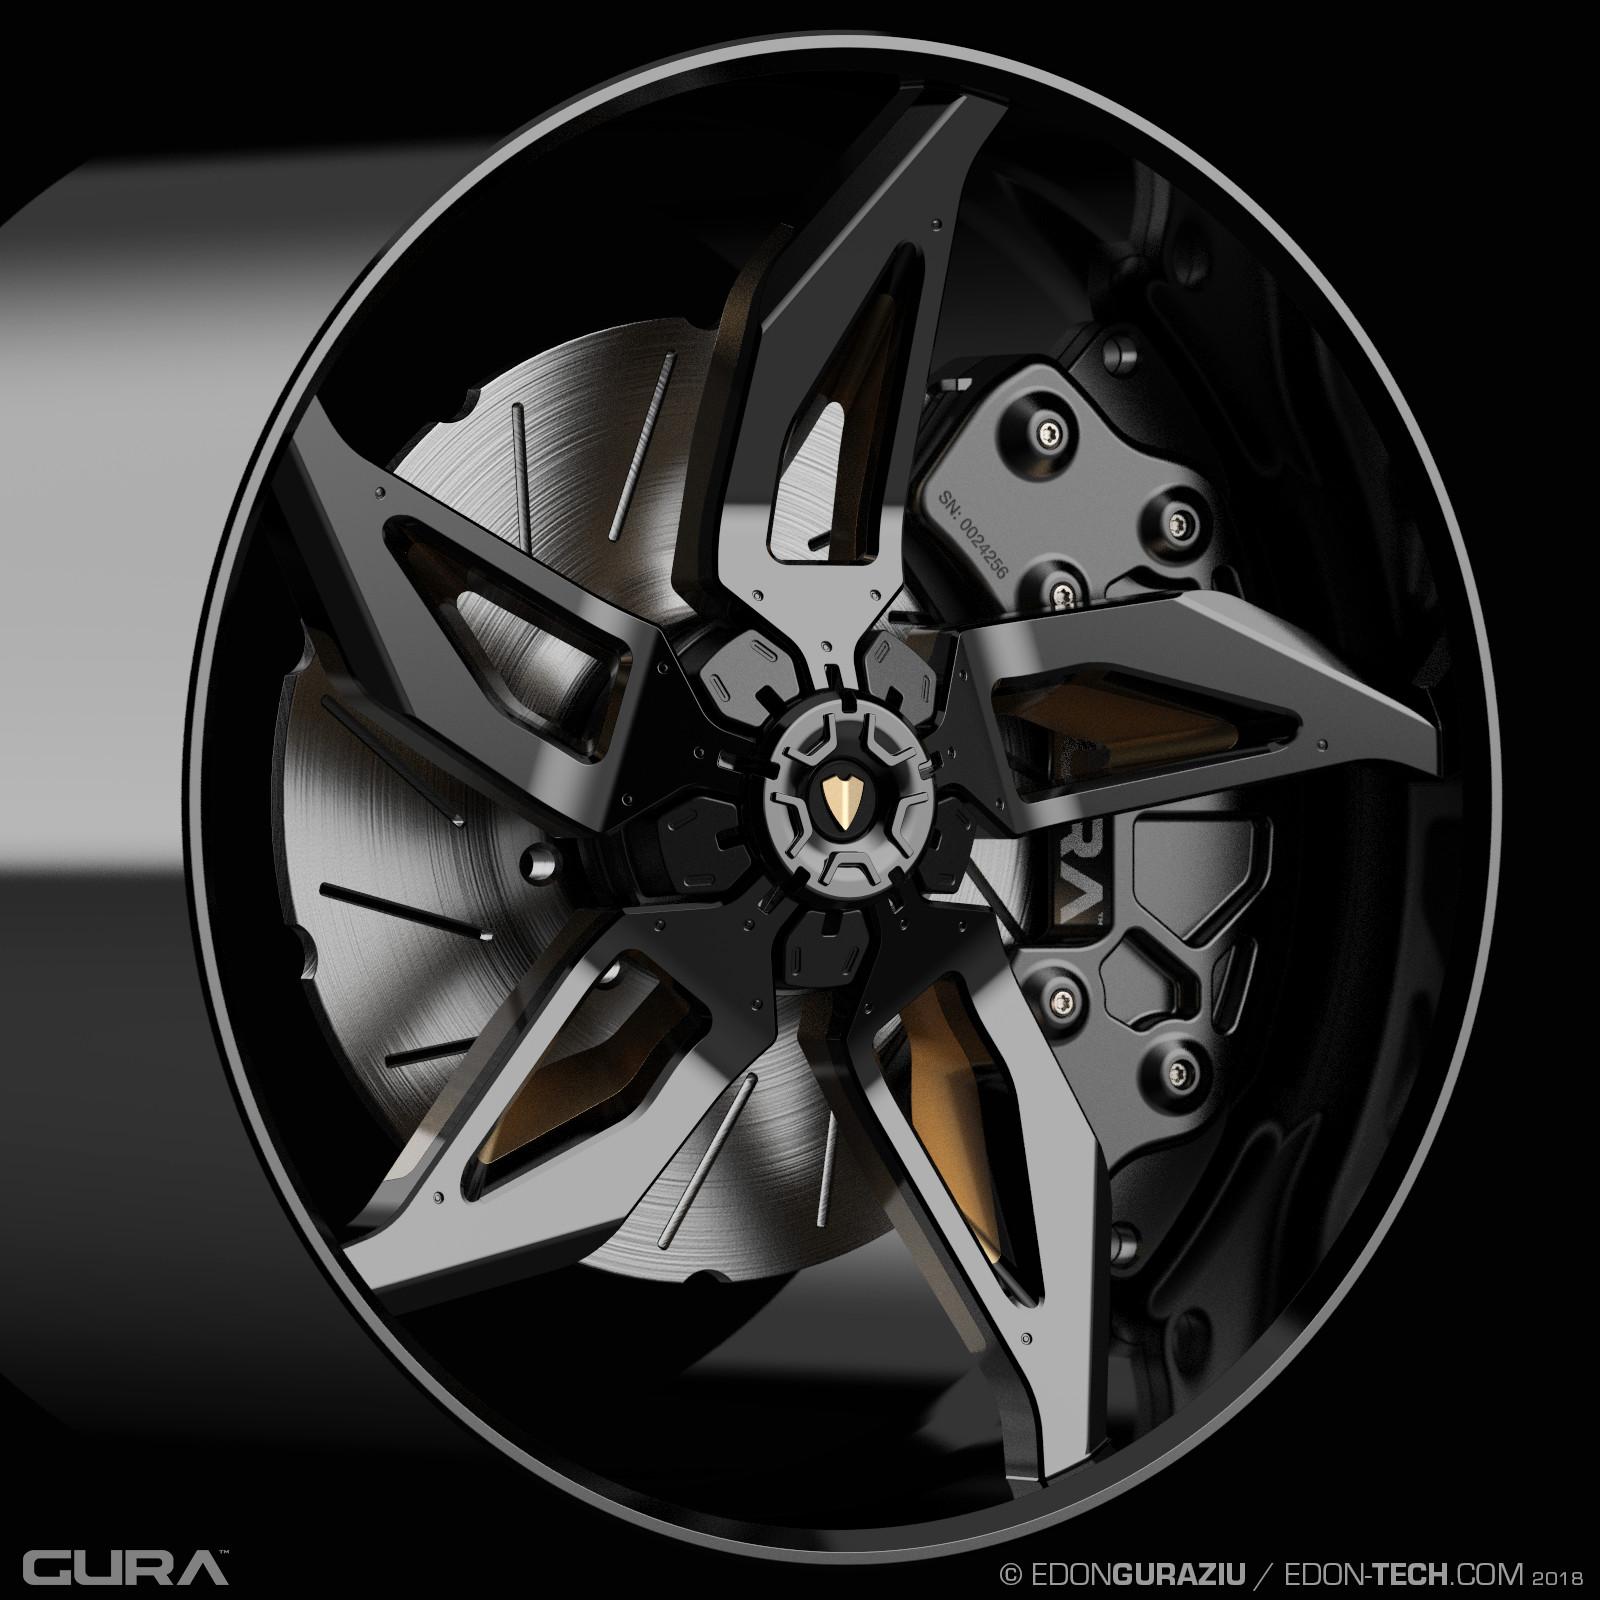 Edon guraziu gura black wheel 004